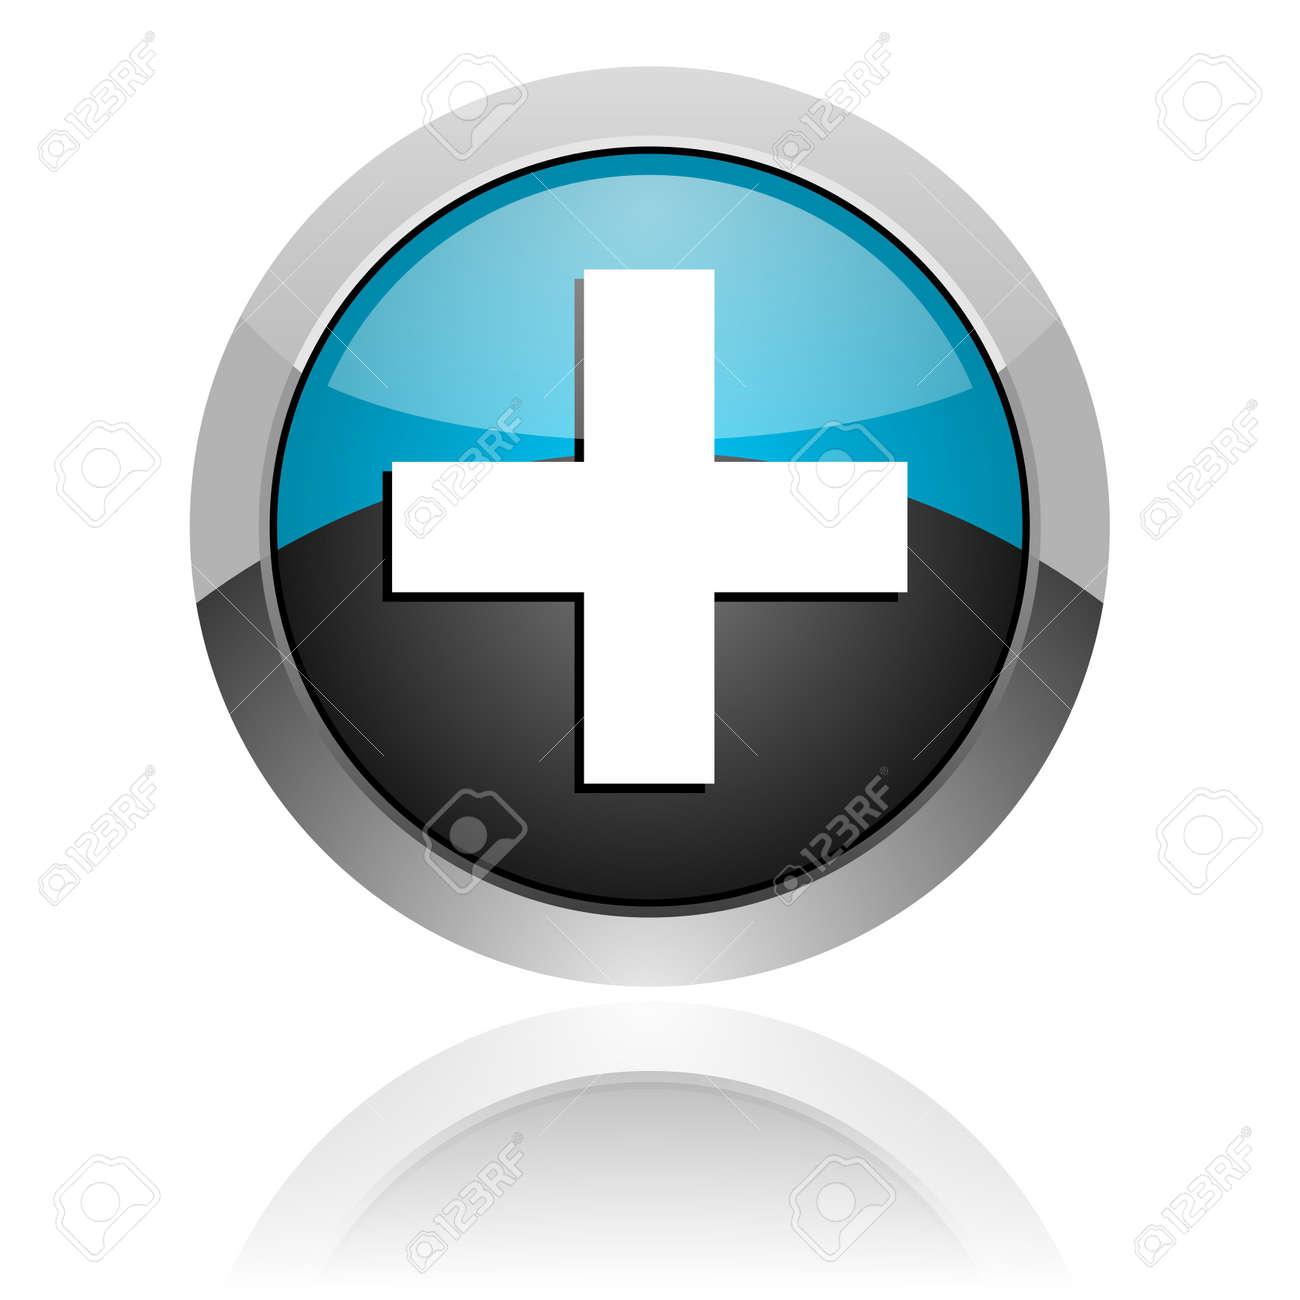 emergency icon Stock Photo - 14805188